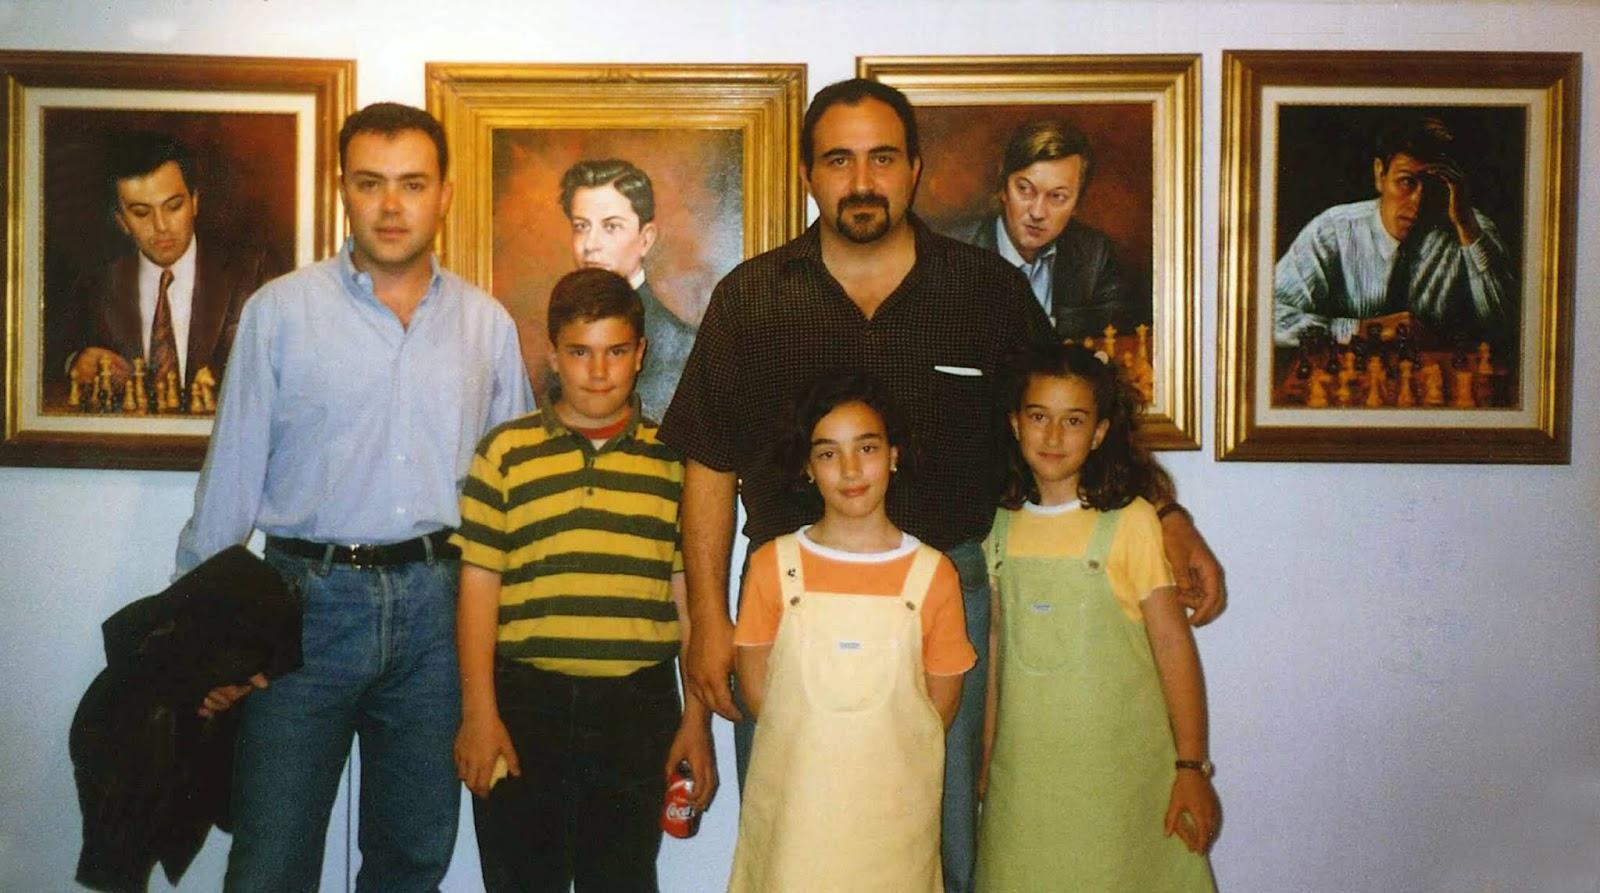 Partidas Memorables - A.Romero - M.Outerelo - (Albacete -1989) - Comentada por GM Alfonso Romero.